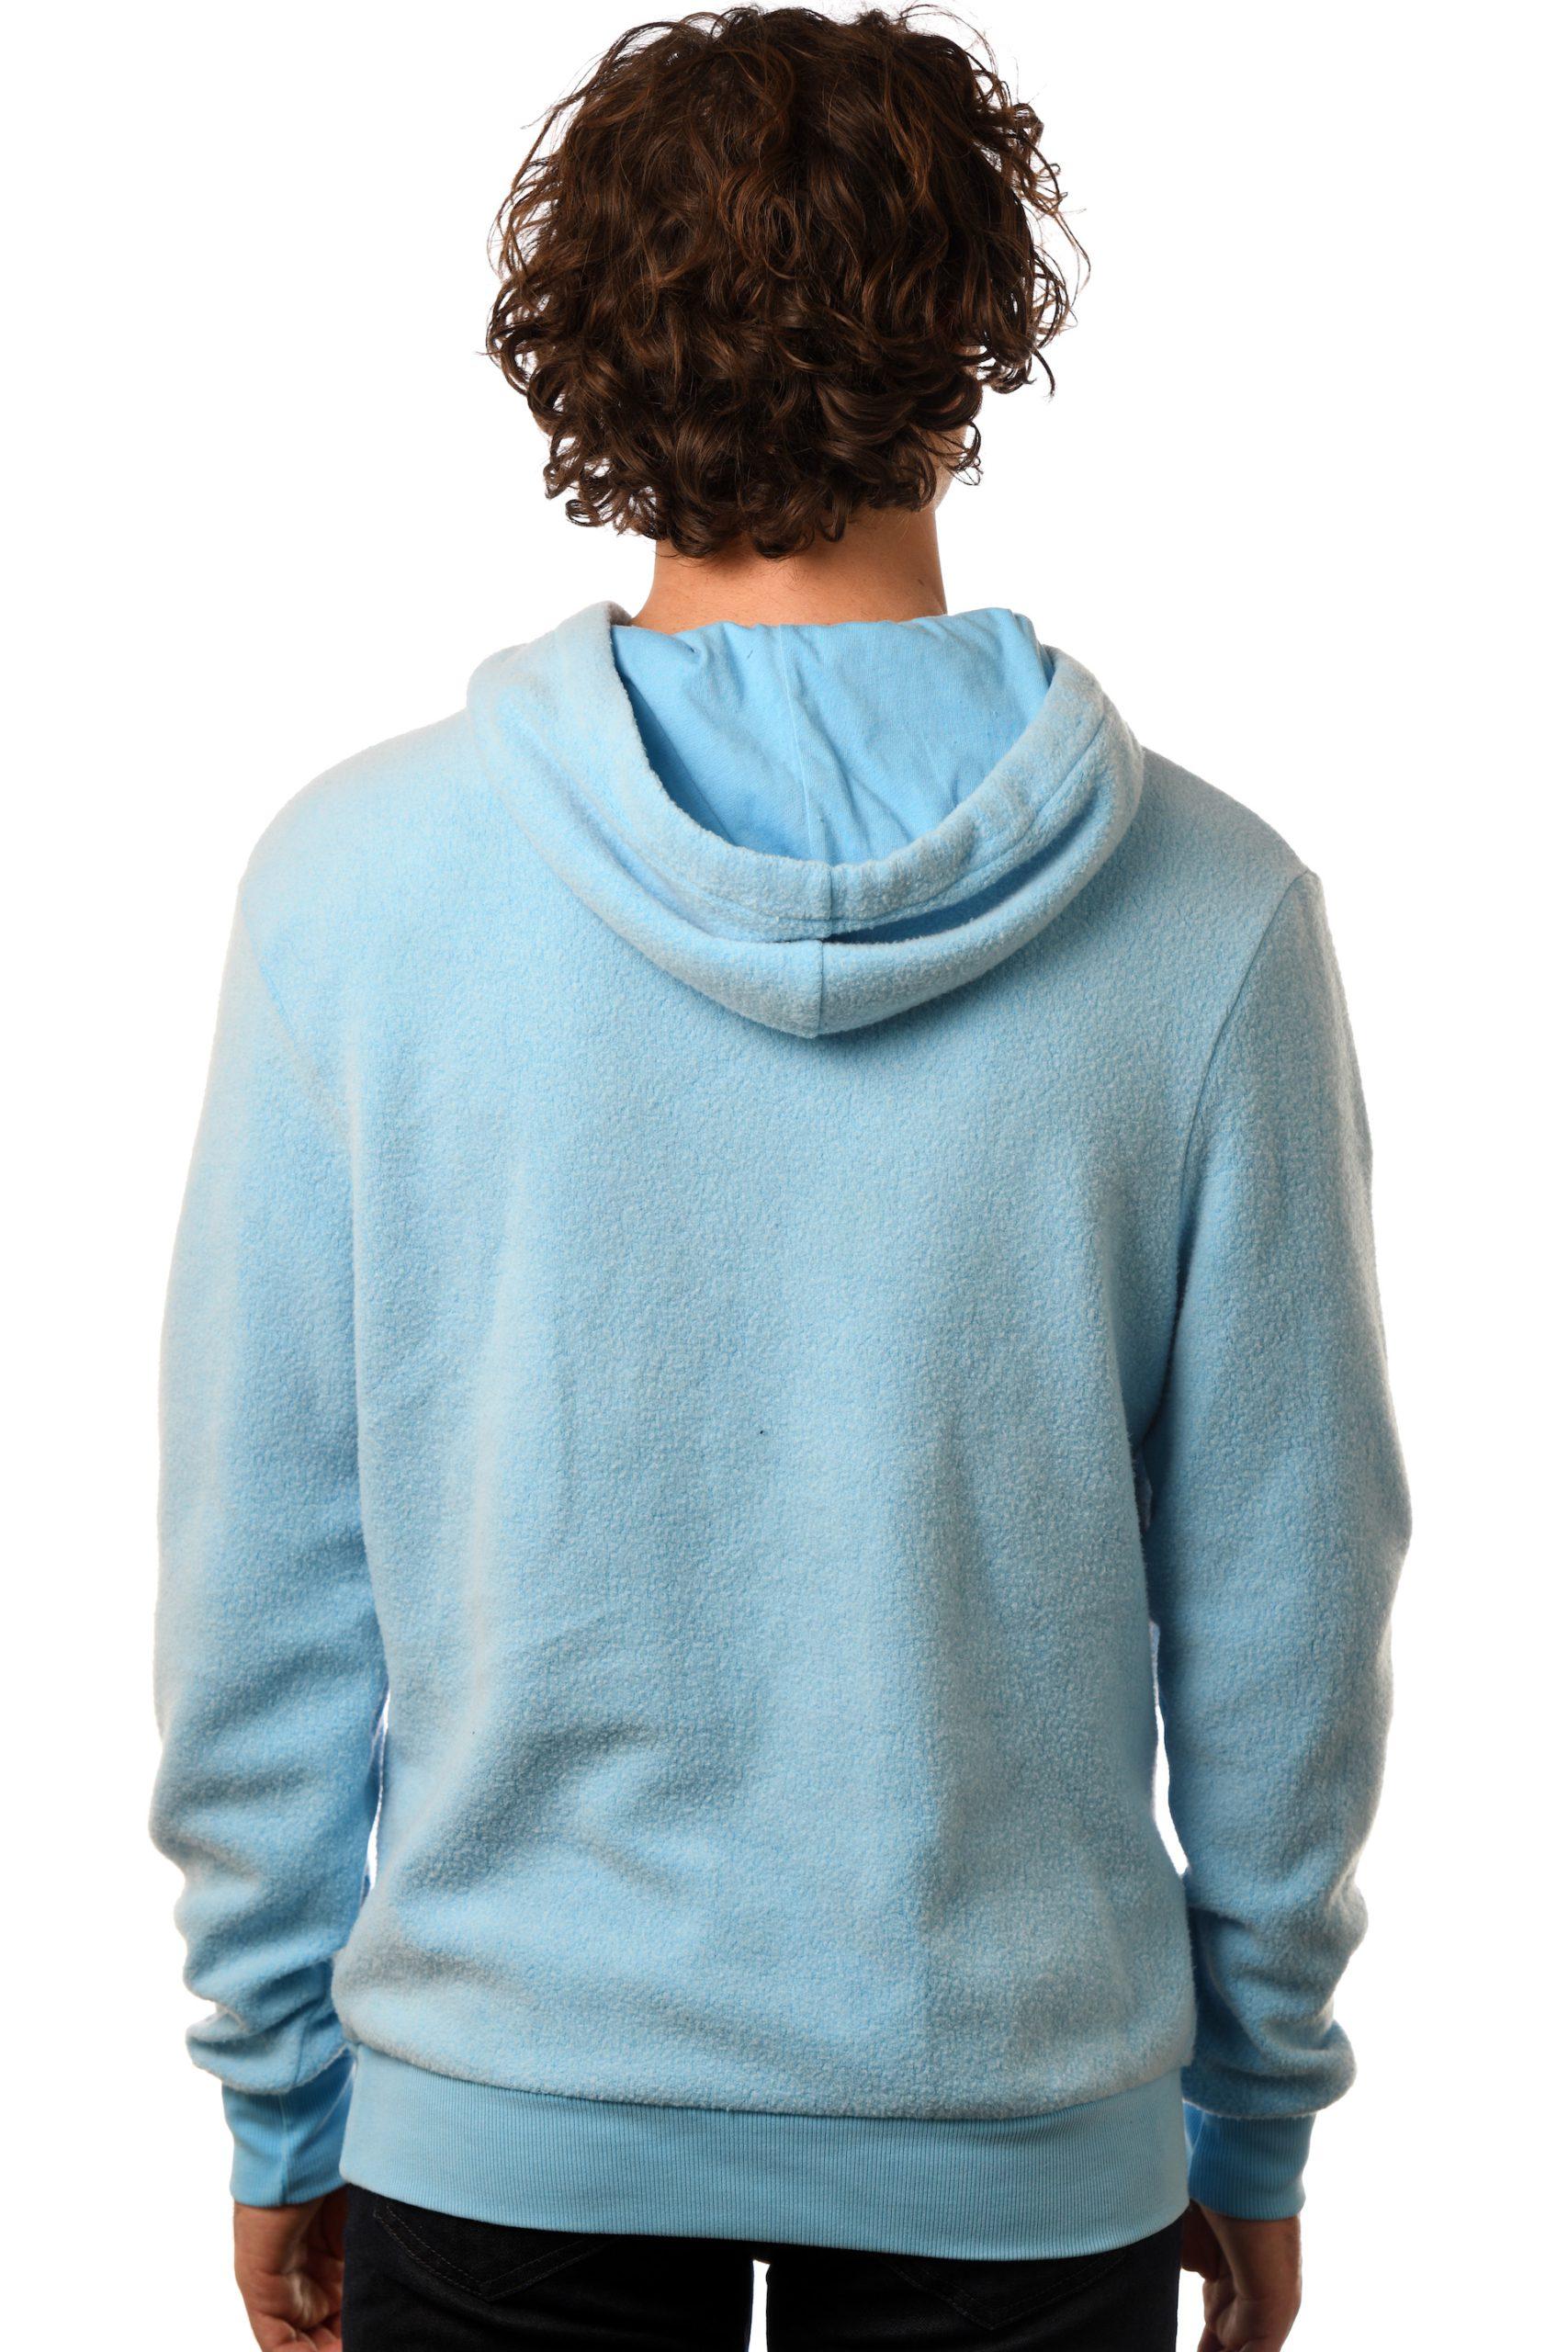 GG 797-F Unisex Furry Fleece Pullover back